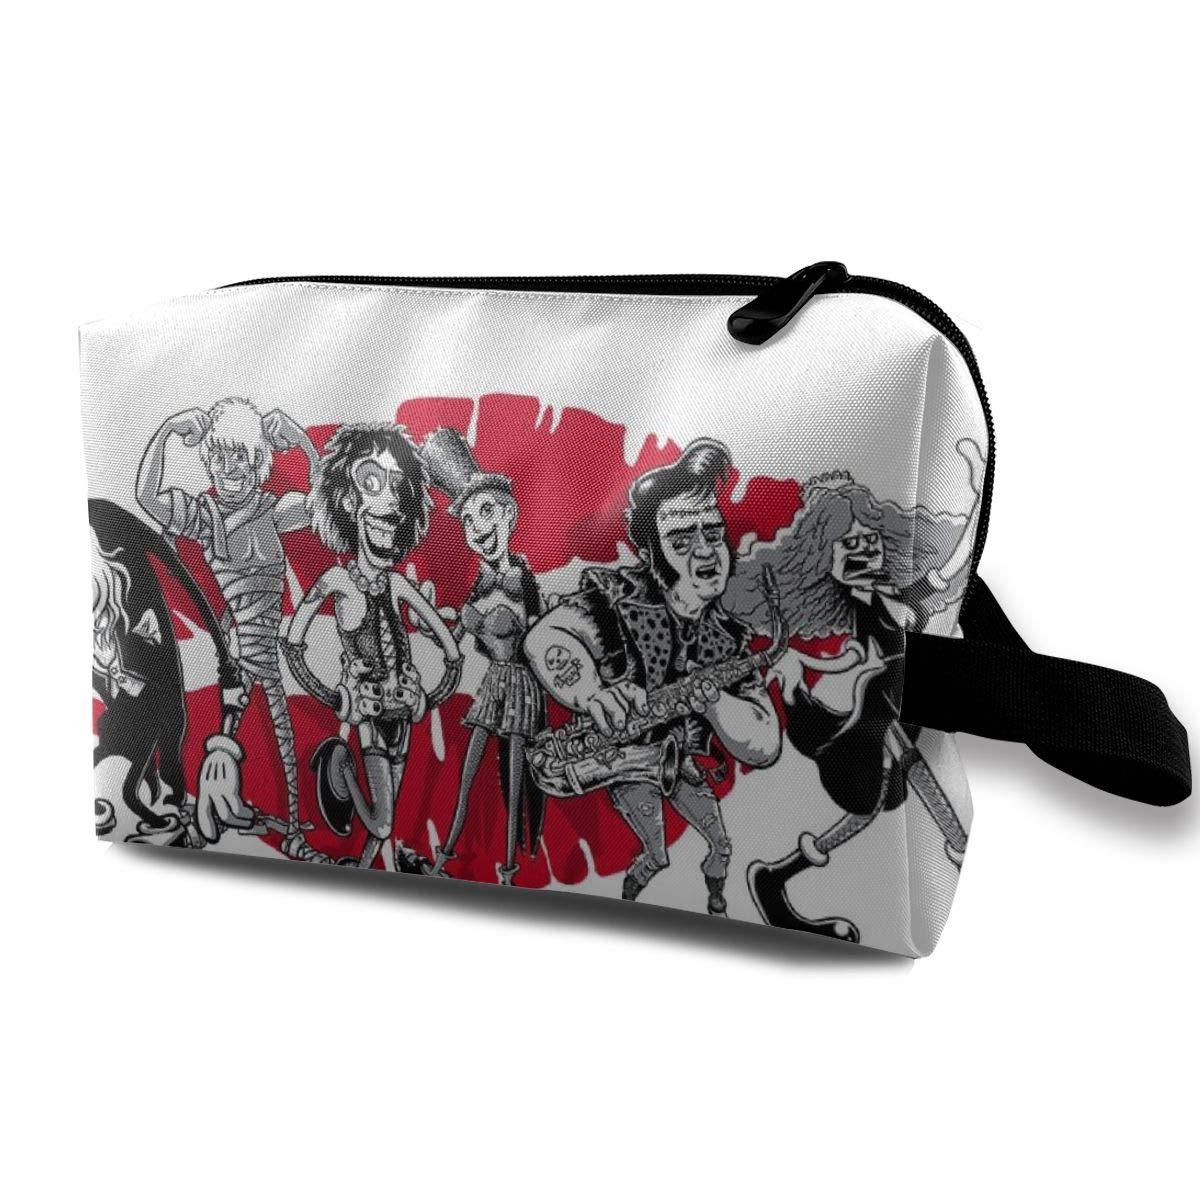 Rocky Horror Picture Show Gang of Six Backpack Daypack Rucksack Laptop Shoulder Bag with USB Charging Port